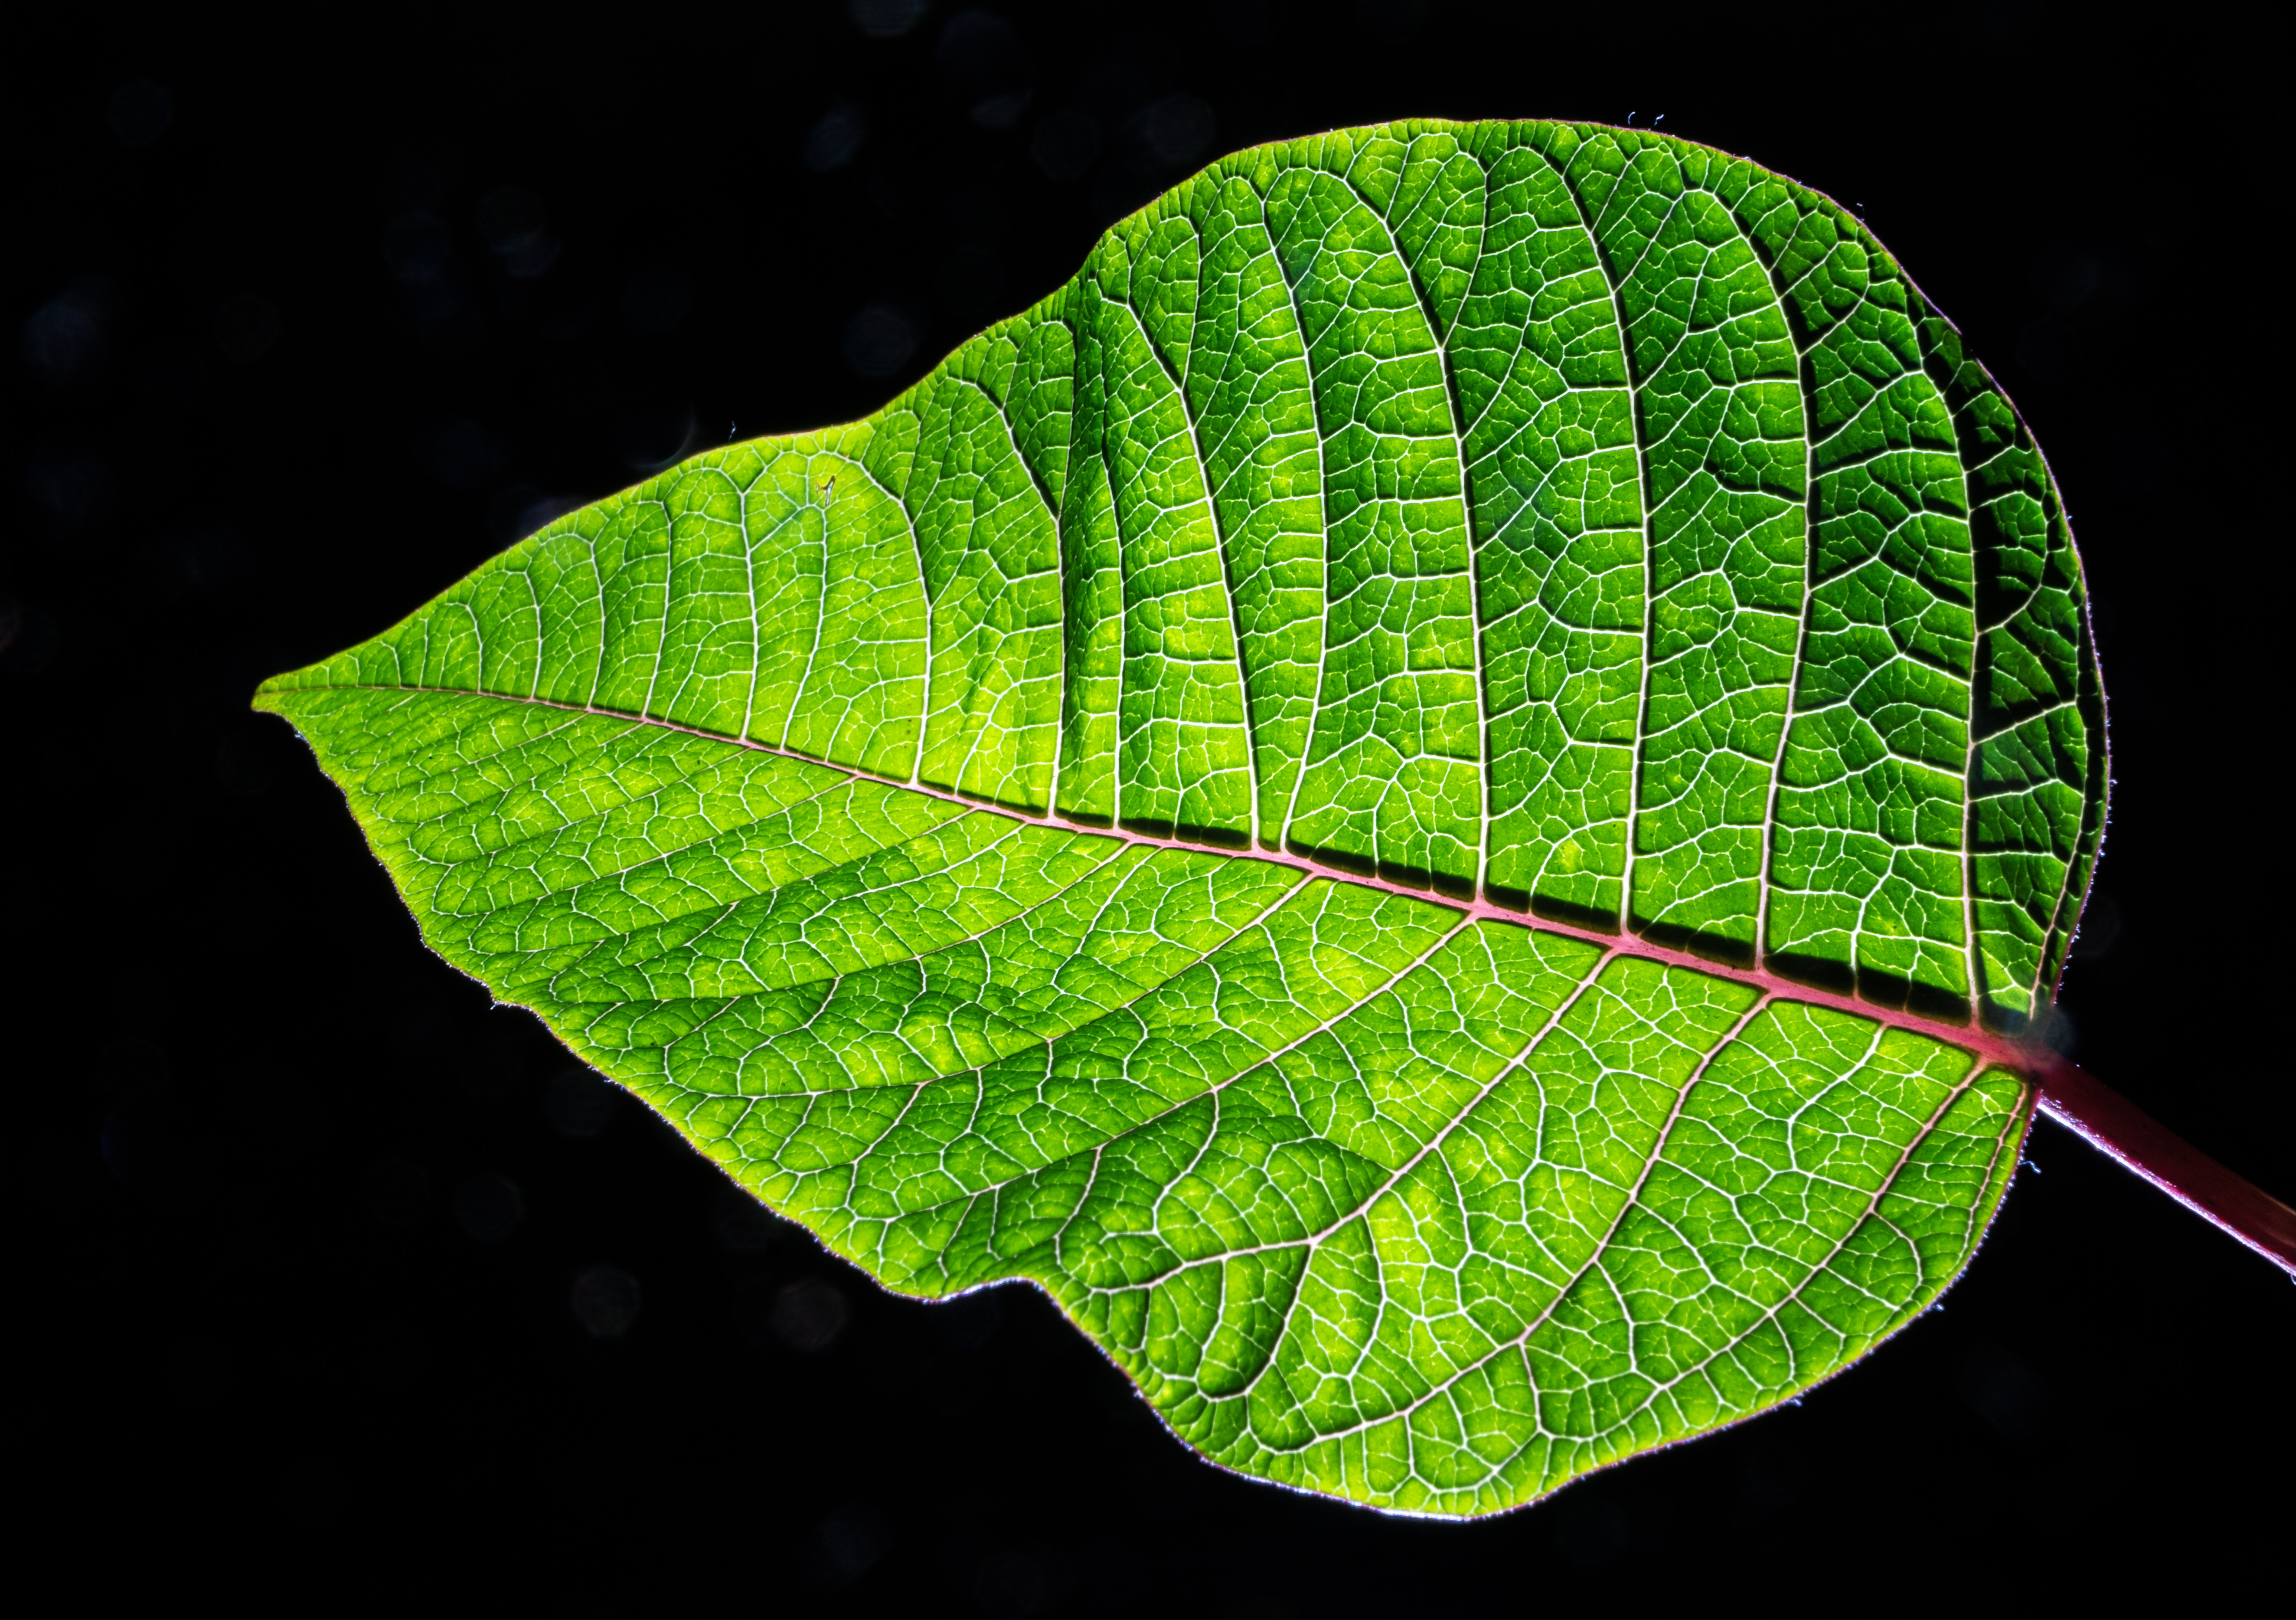 leaf nature plant photosynthesis pexels plants sustainability ad